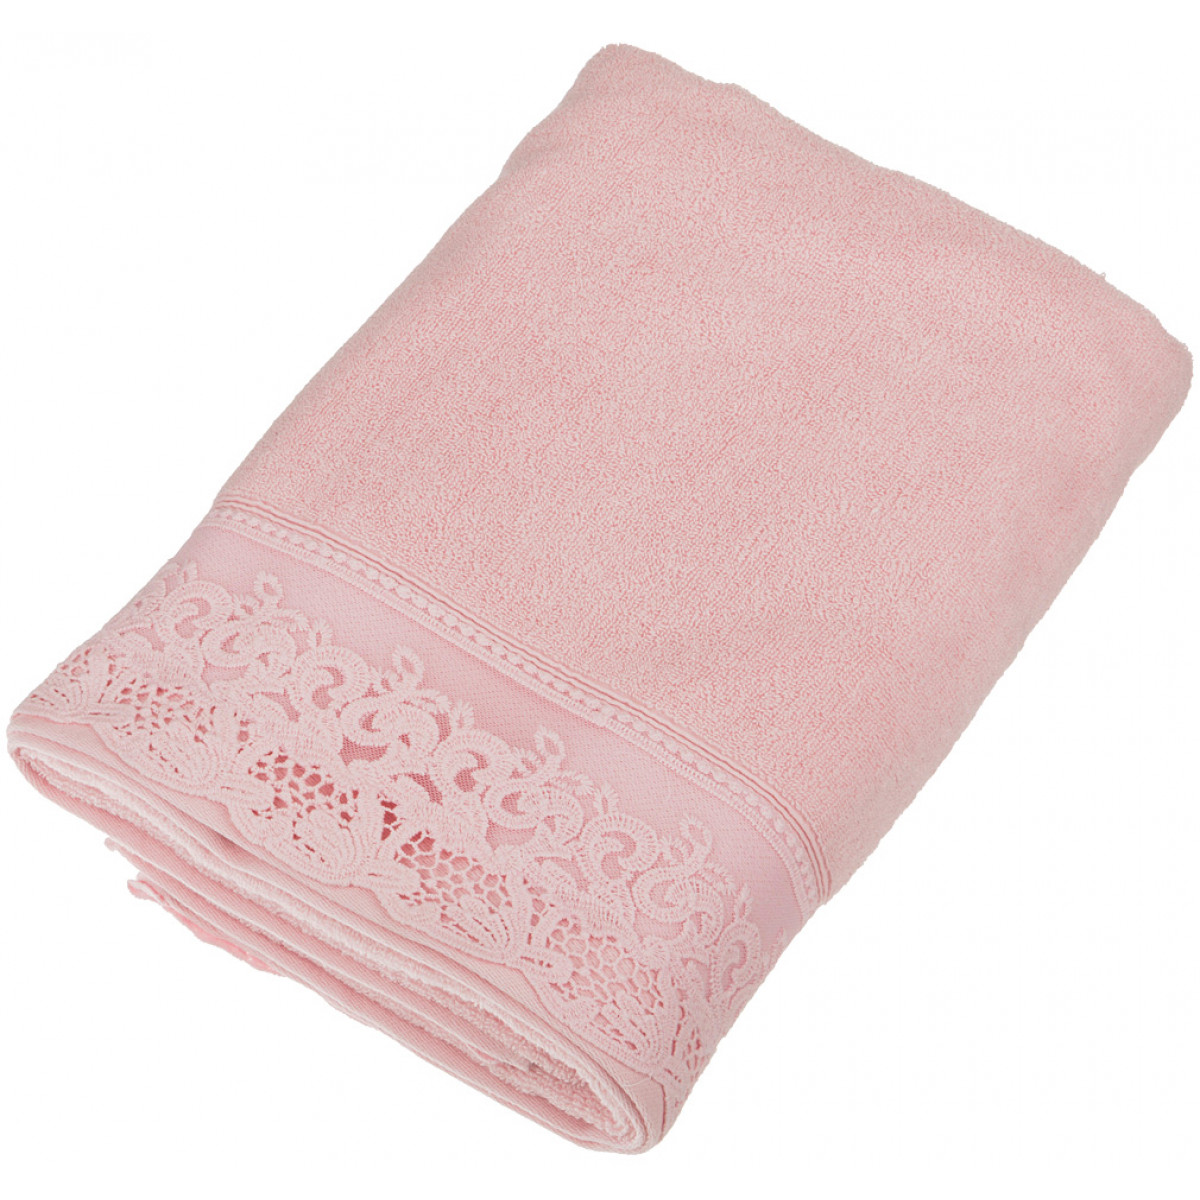 Полотенца Santalino Полотенце Terra  (50х90 см) полотенца santalino полотенце shulamite 40х70 см